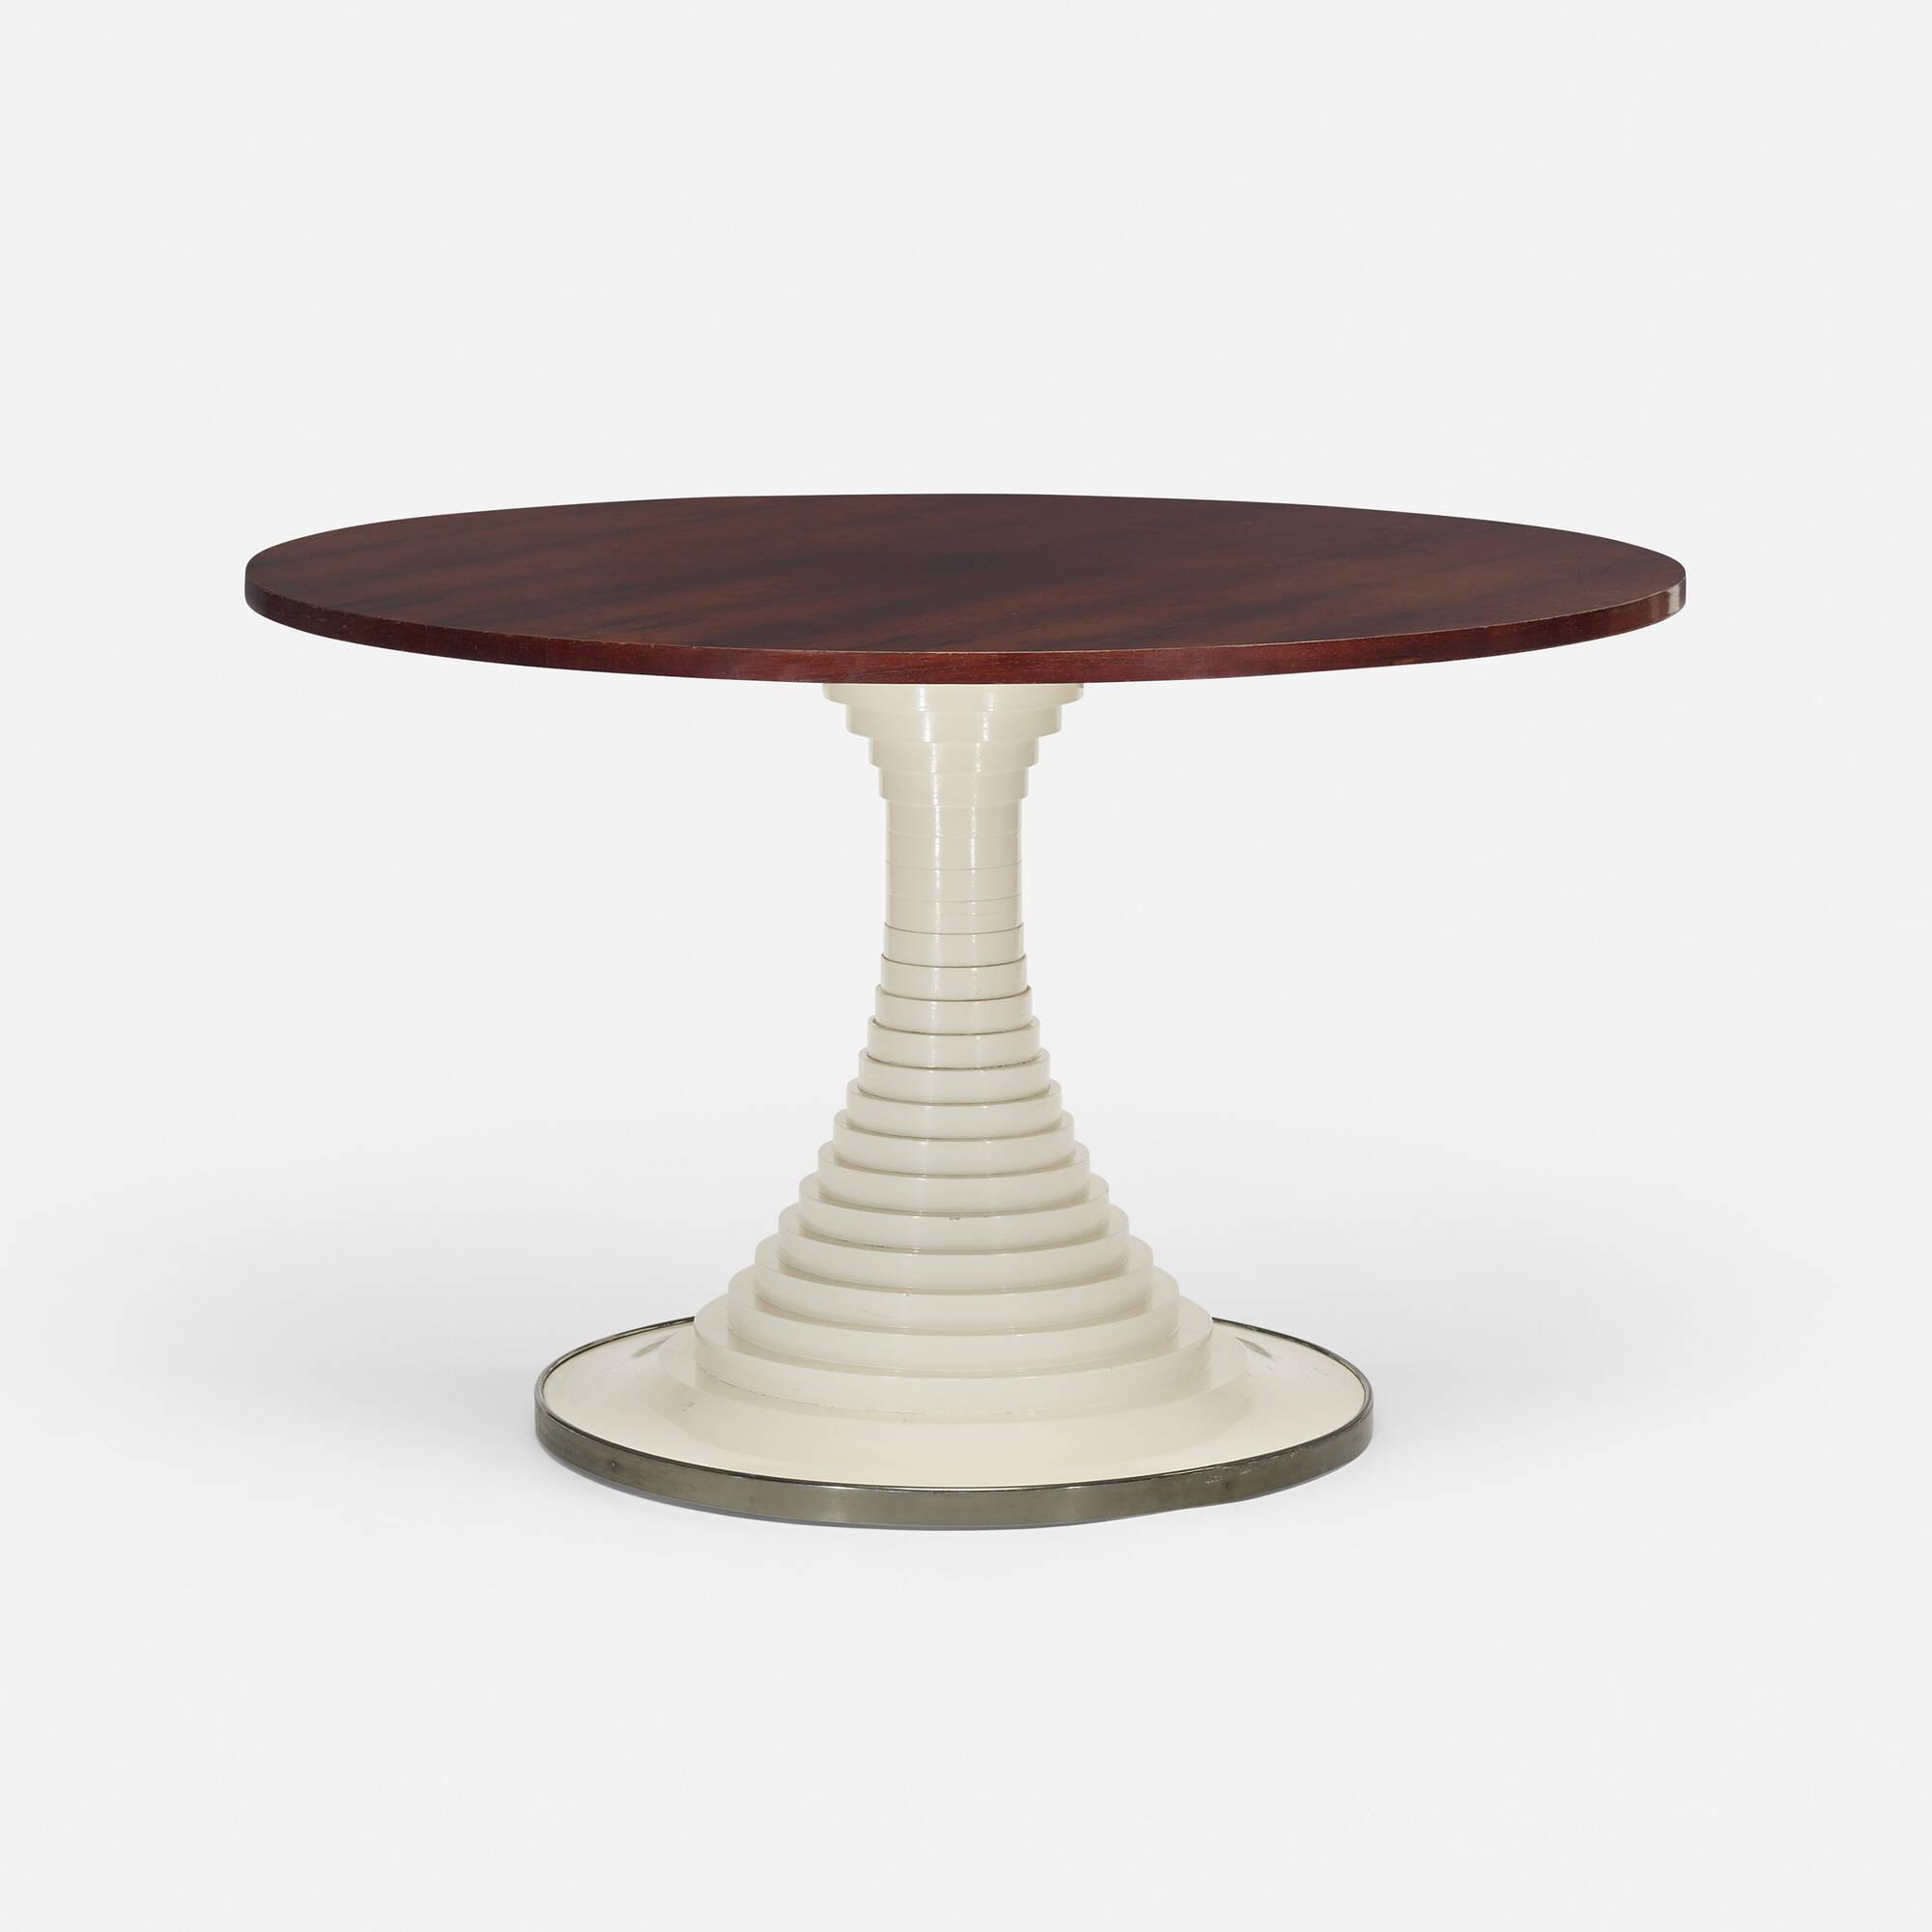 table de 180 214: Carlo de Carli - dining table, model 180 (1 of 3)